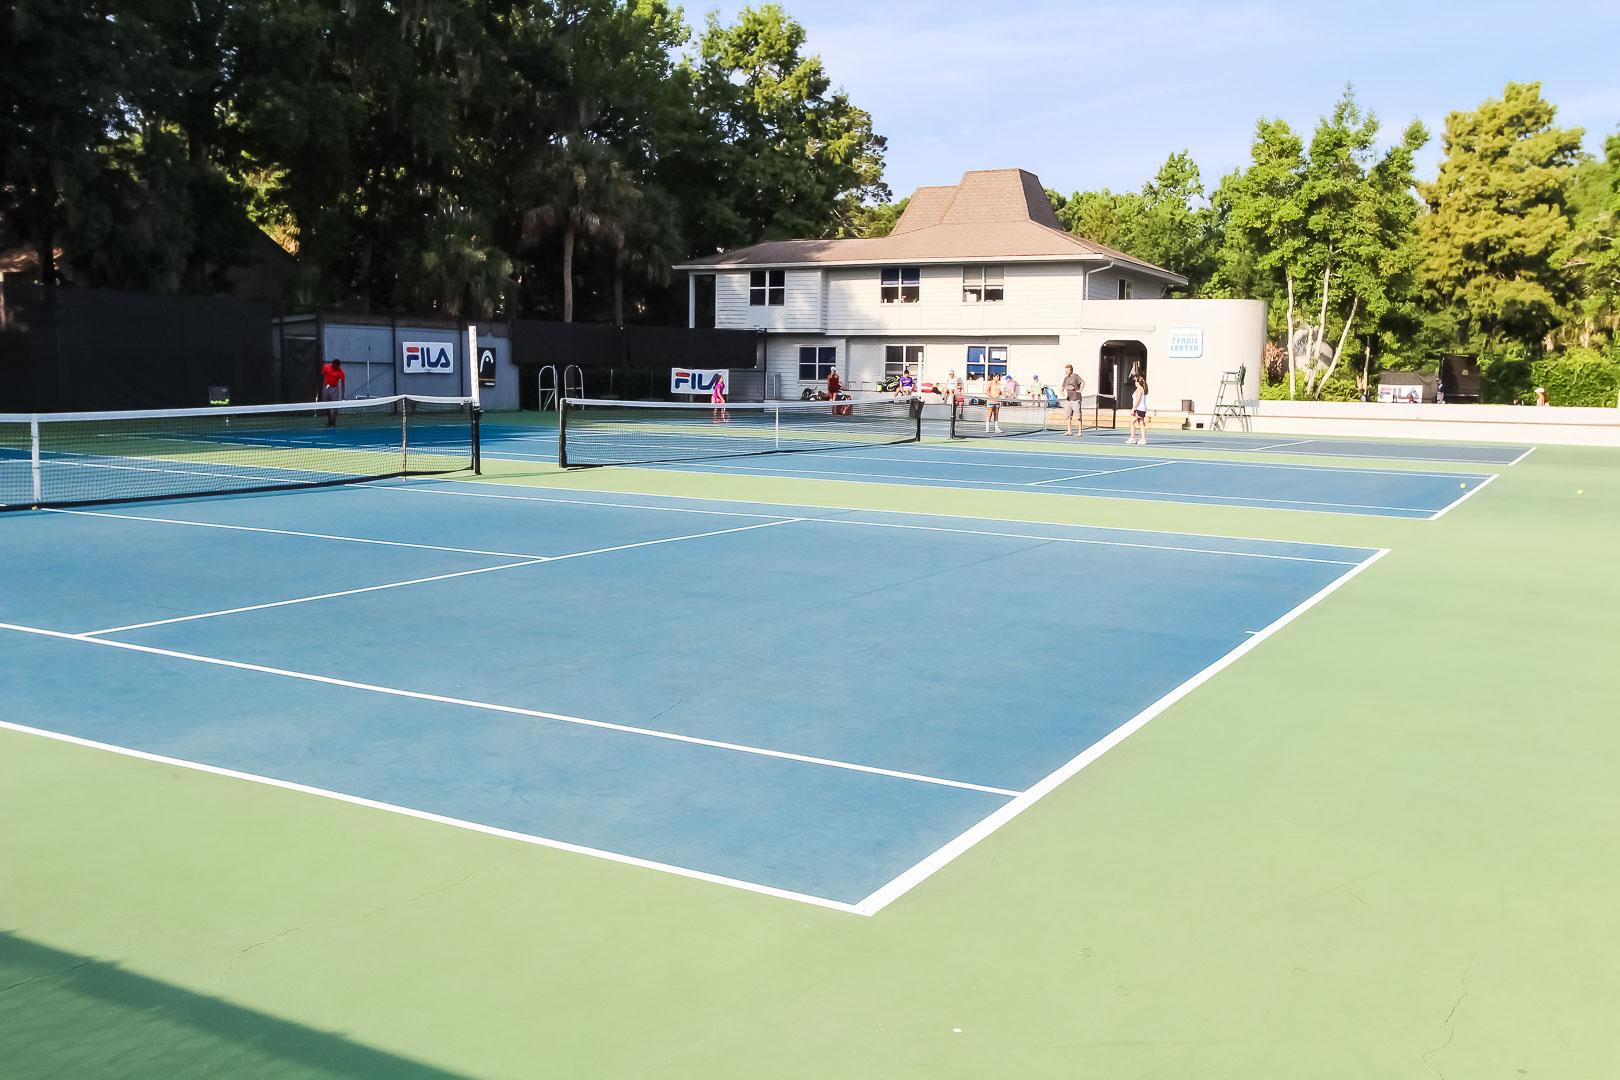 An outdoor tennis court at VRI's Players Club Resort in Hilton Head Island, South Carolina.